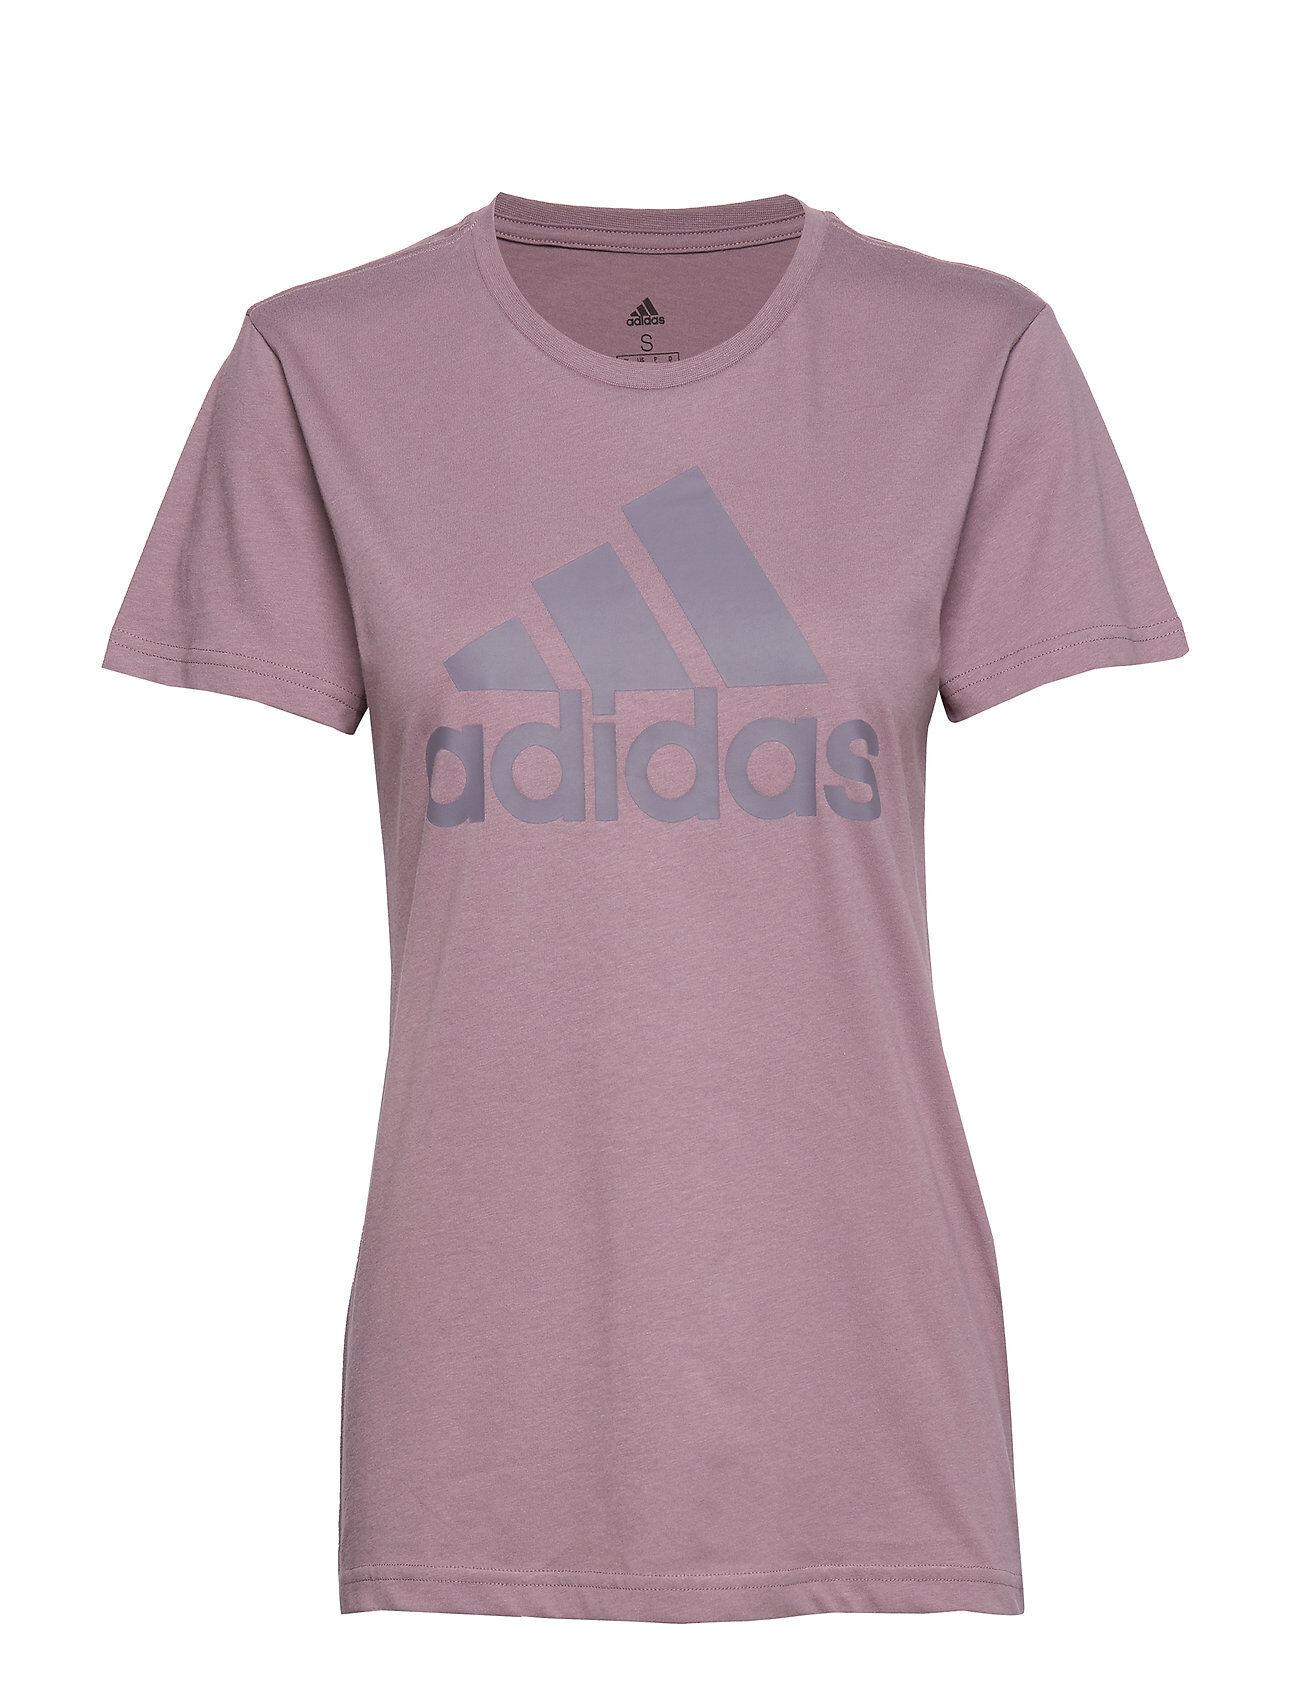 Image of adidas Performance W Bos Co Tee T-shirts & Tops Short-sleeved Liila Adidas Performance